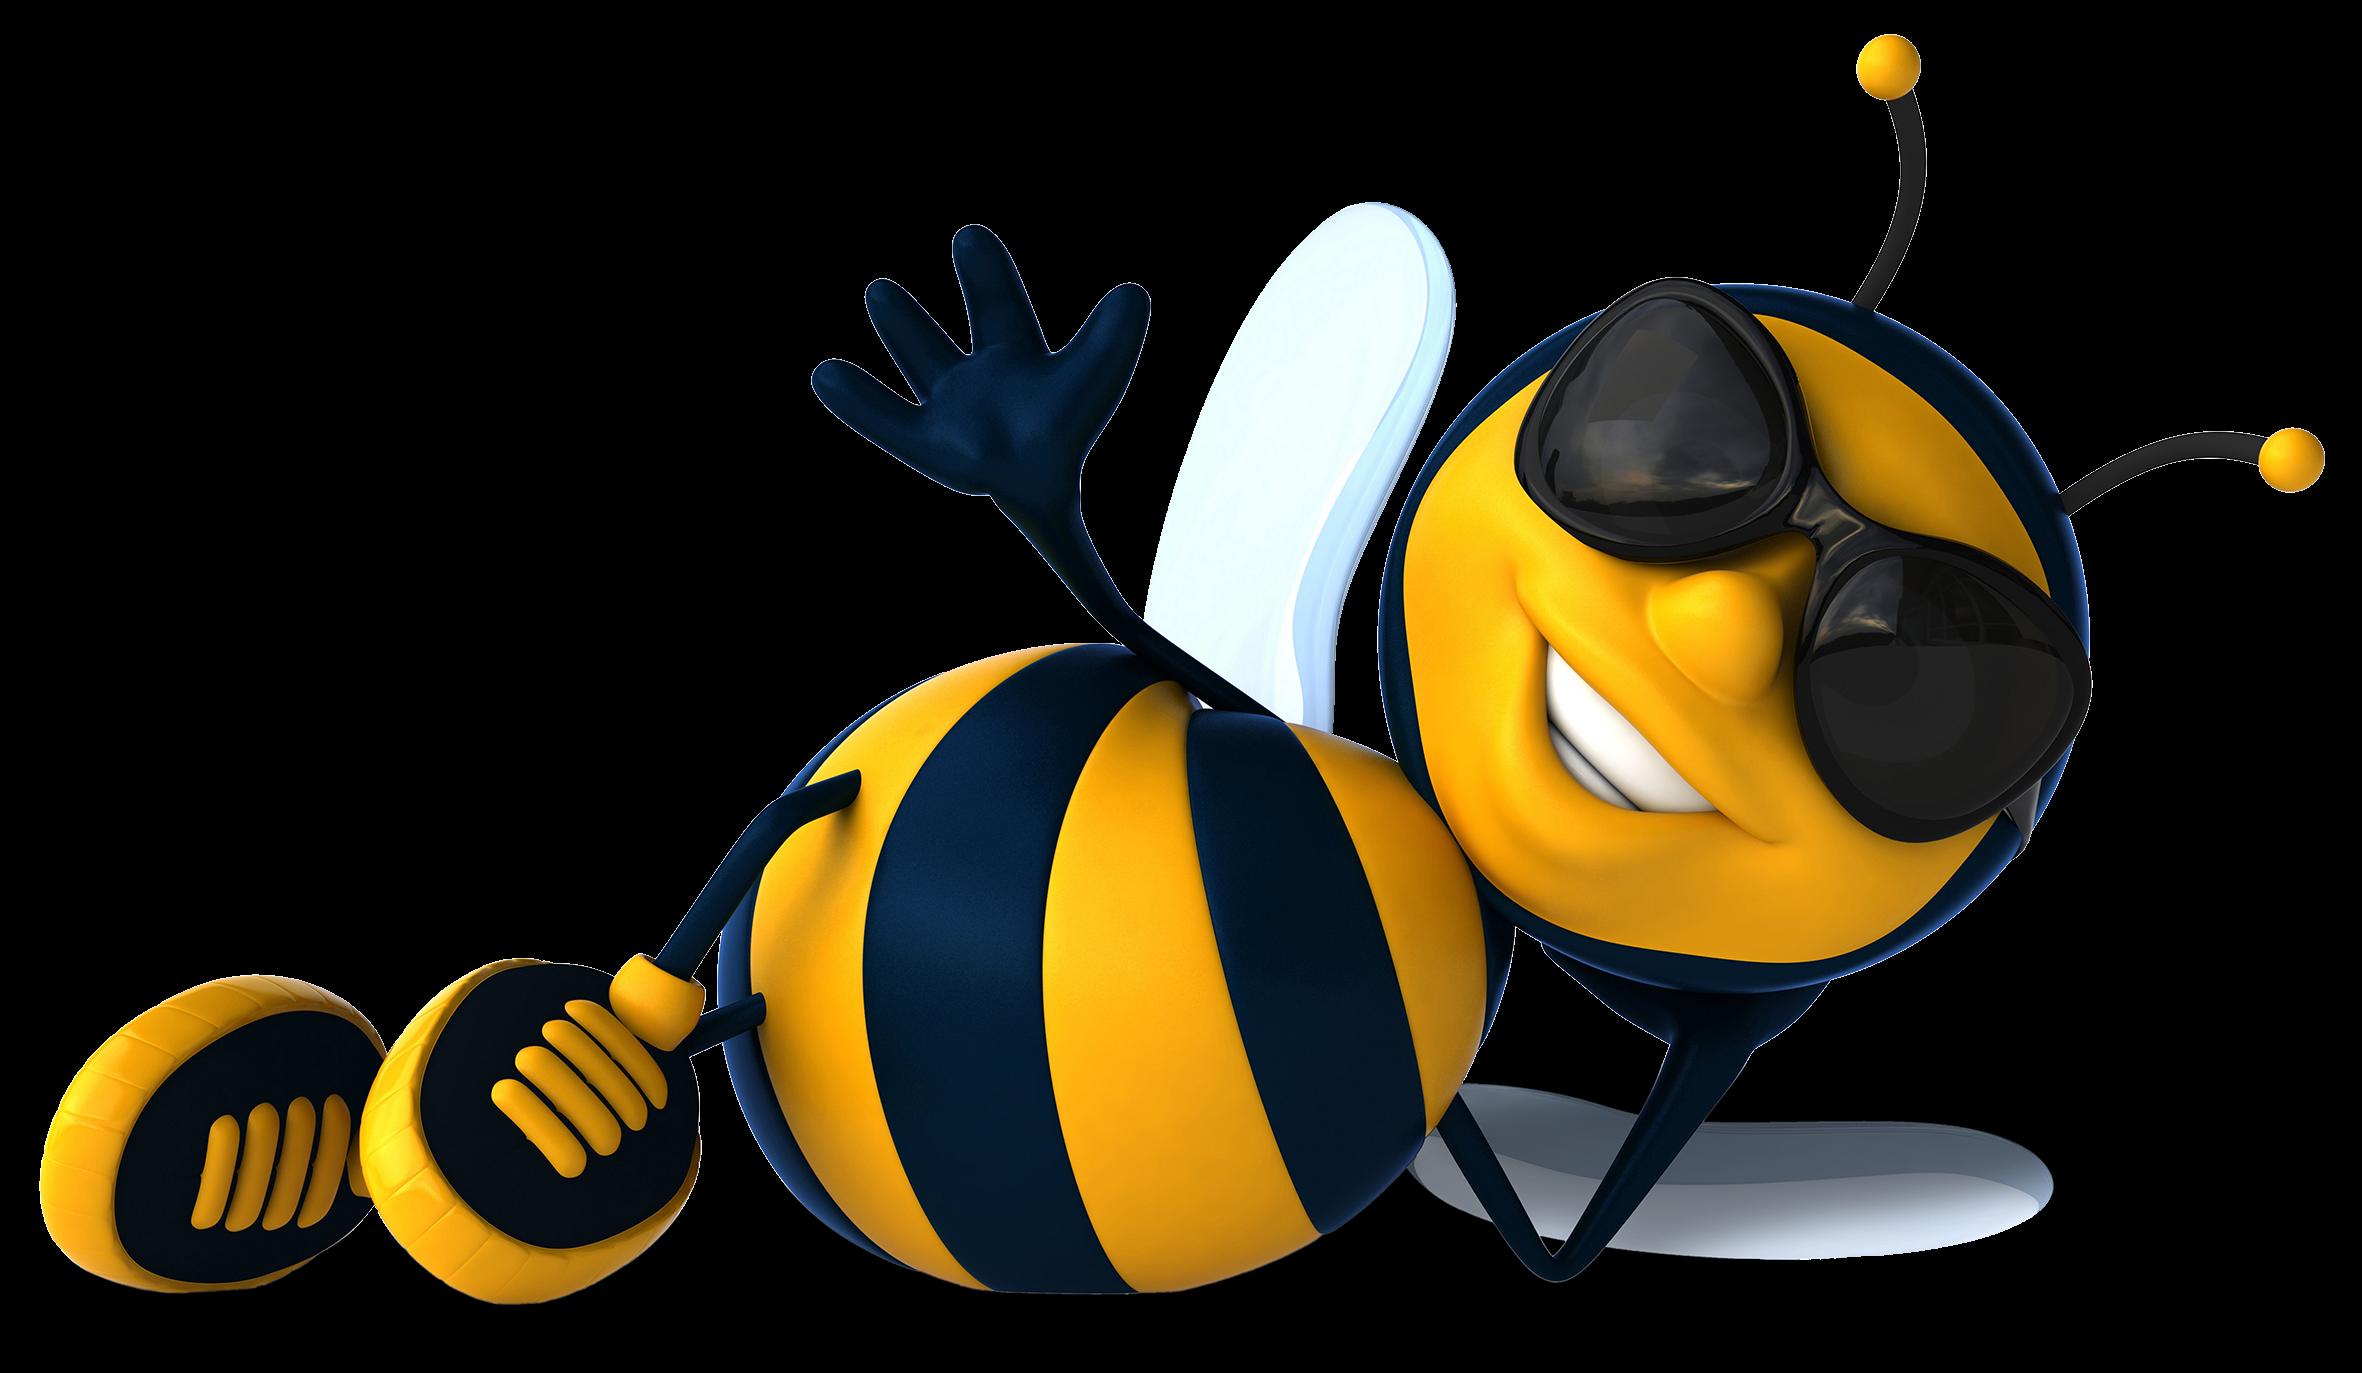 Honeycomb clipart bee nest. Buzz png beekeeping pinterest